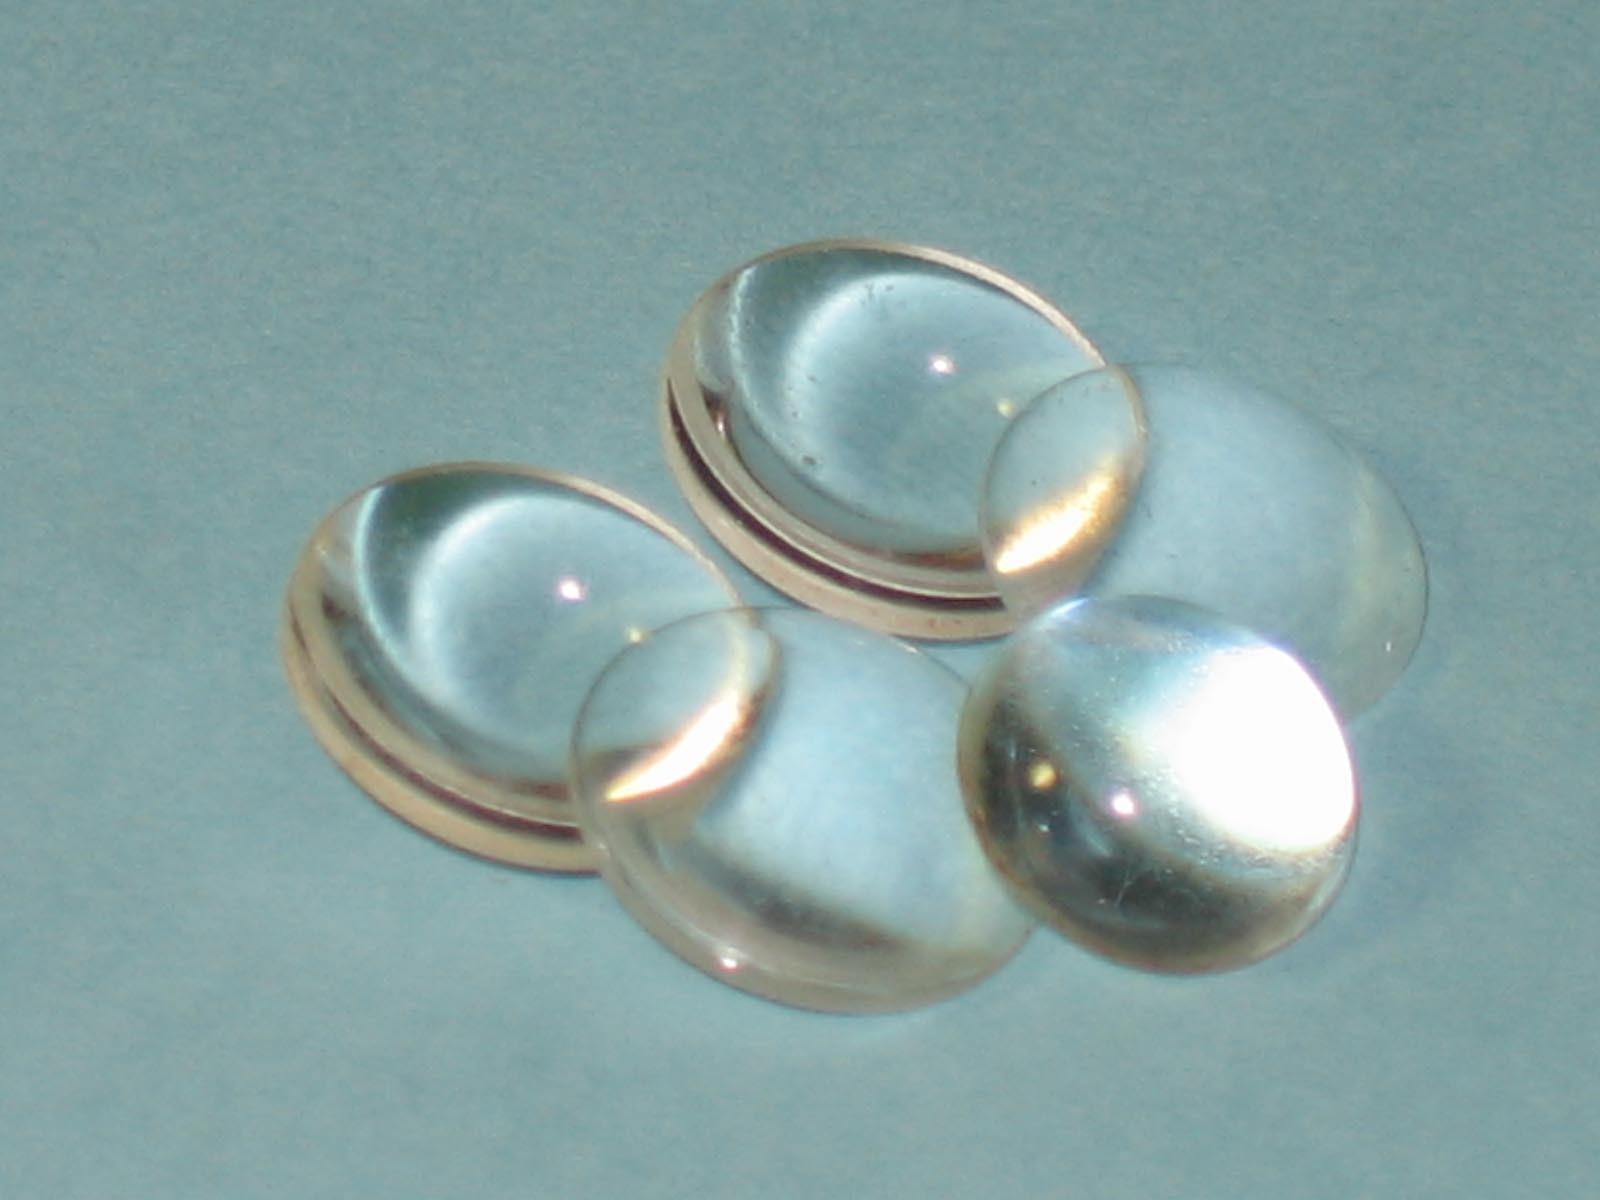 Sunglasses Lens Types | SunglassReplacementLenses.com | 928-445-9194